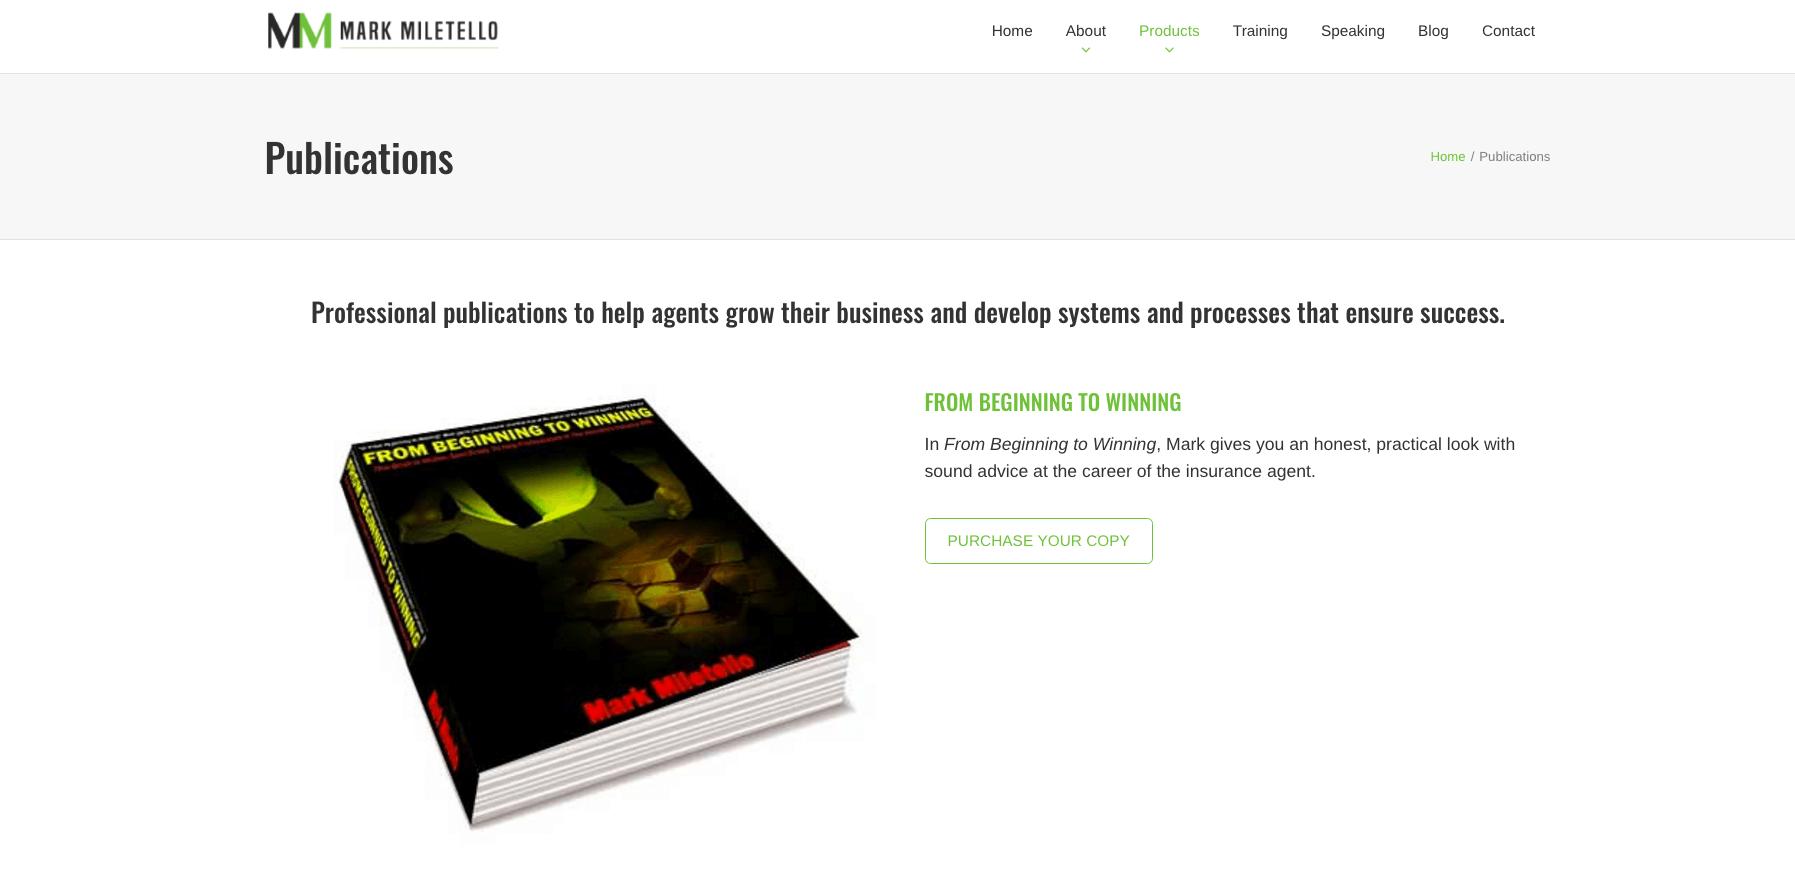 mark-miletello-publications